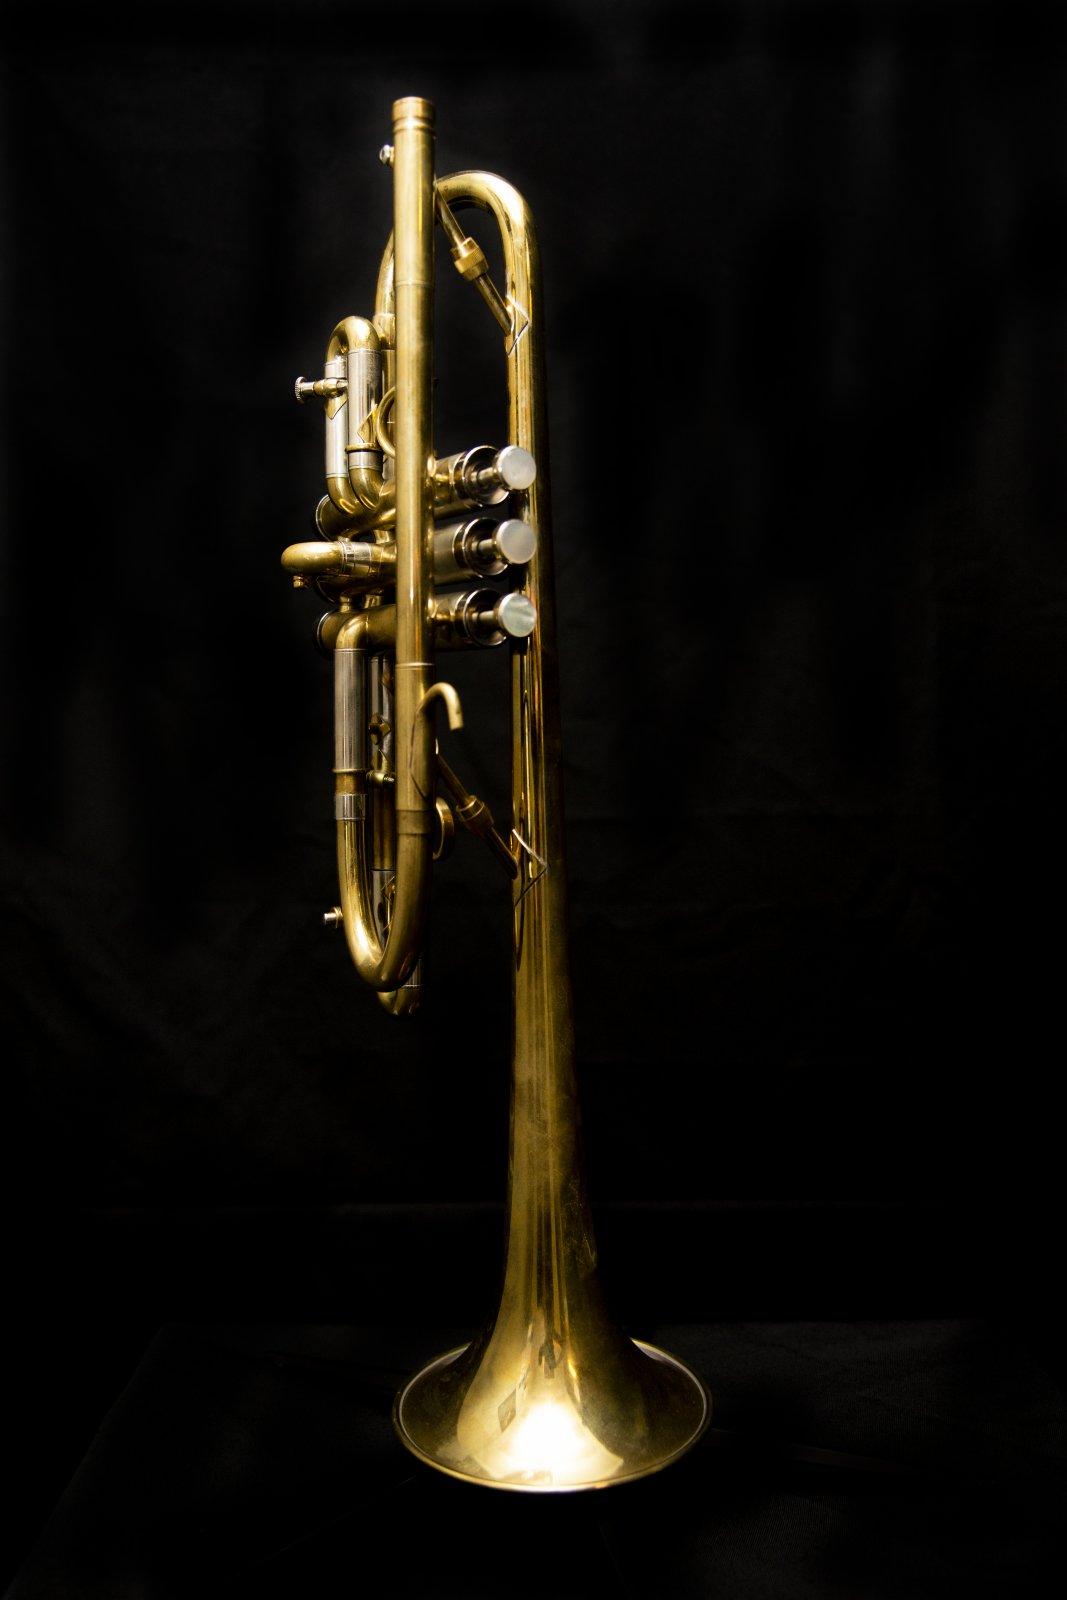 Edwards Generation III C Trumpet